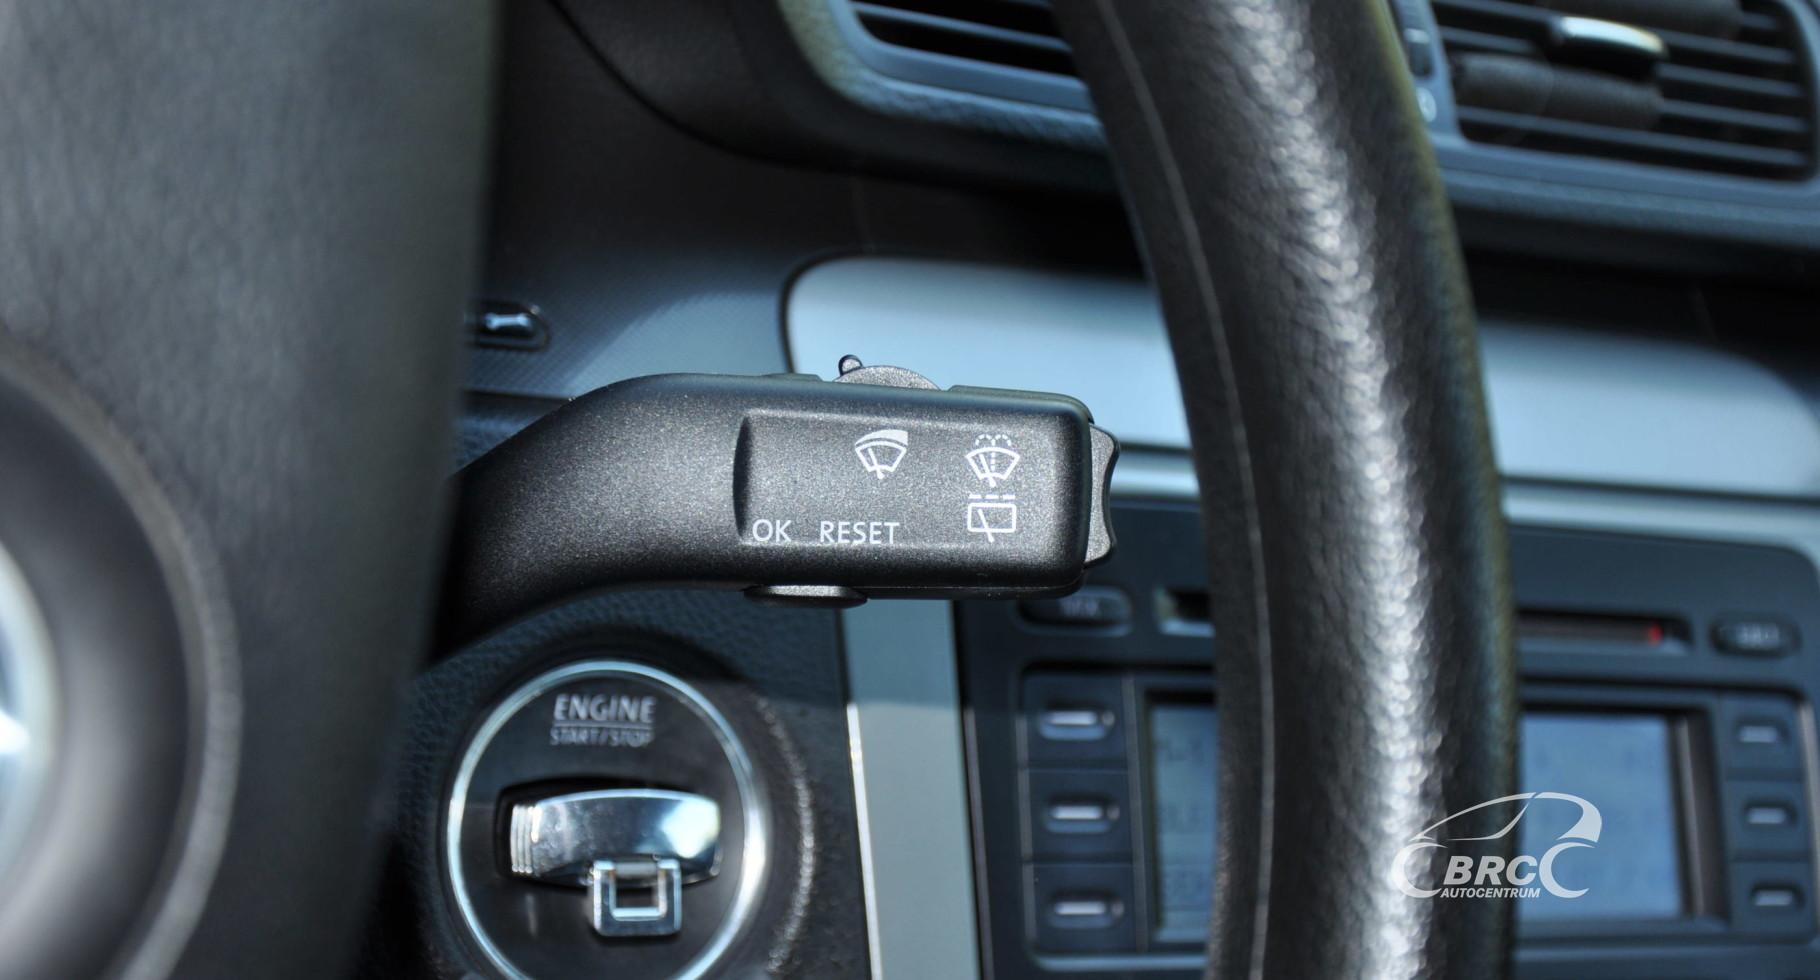 Volkswagen Passat 2 0 TDI Automatas (ID: 804586)   BRC